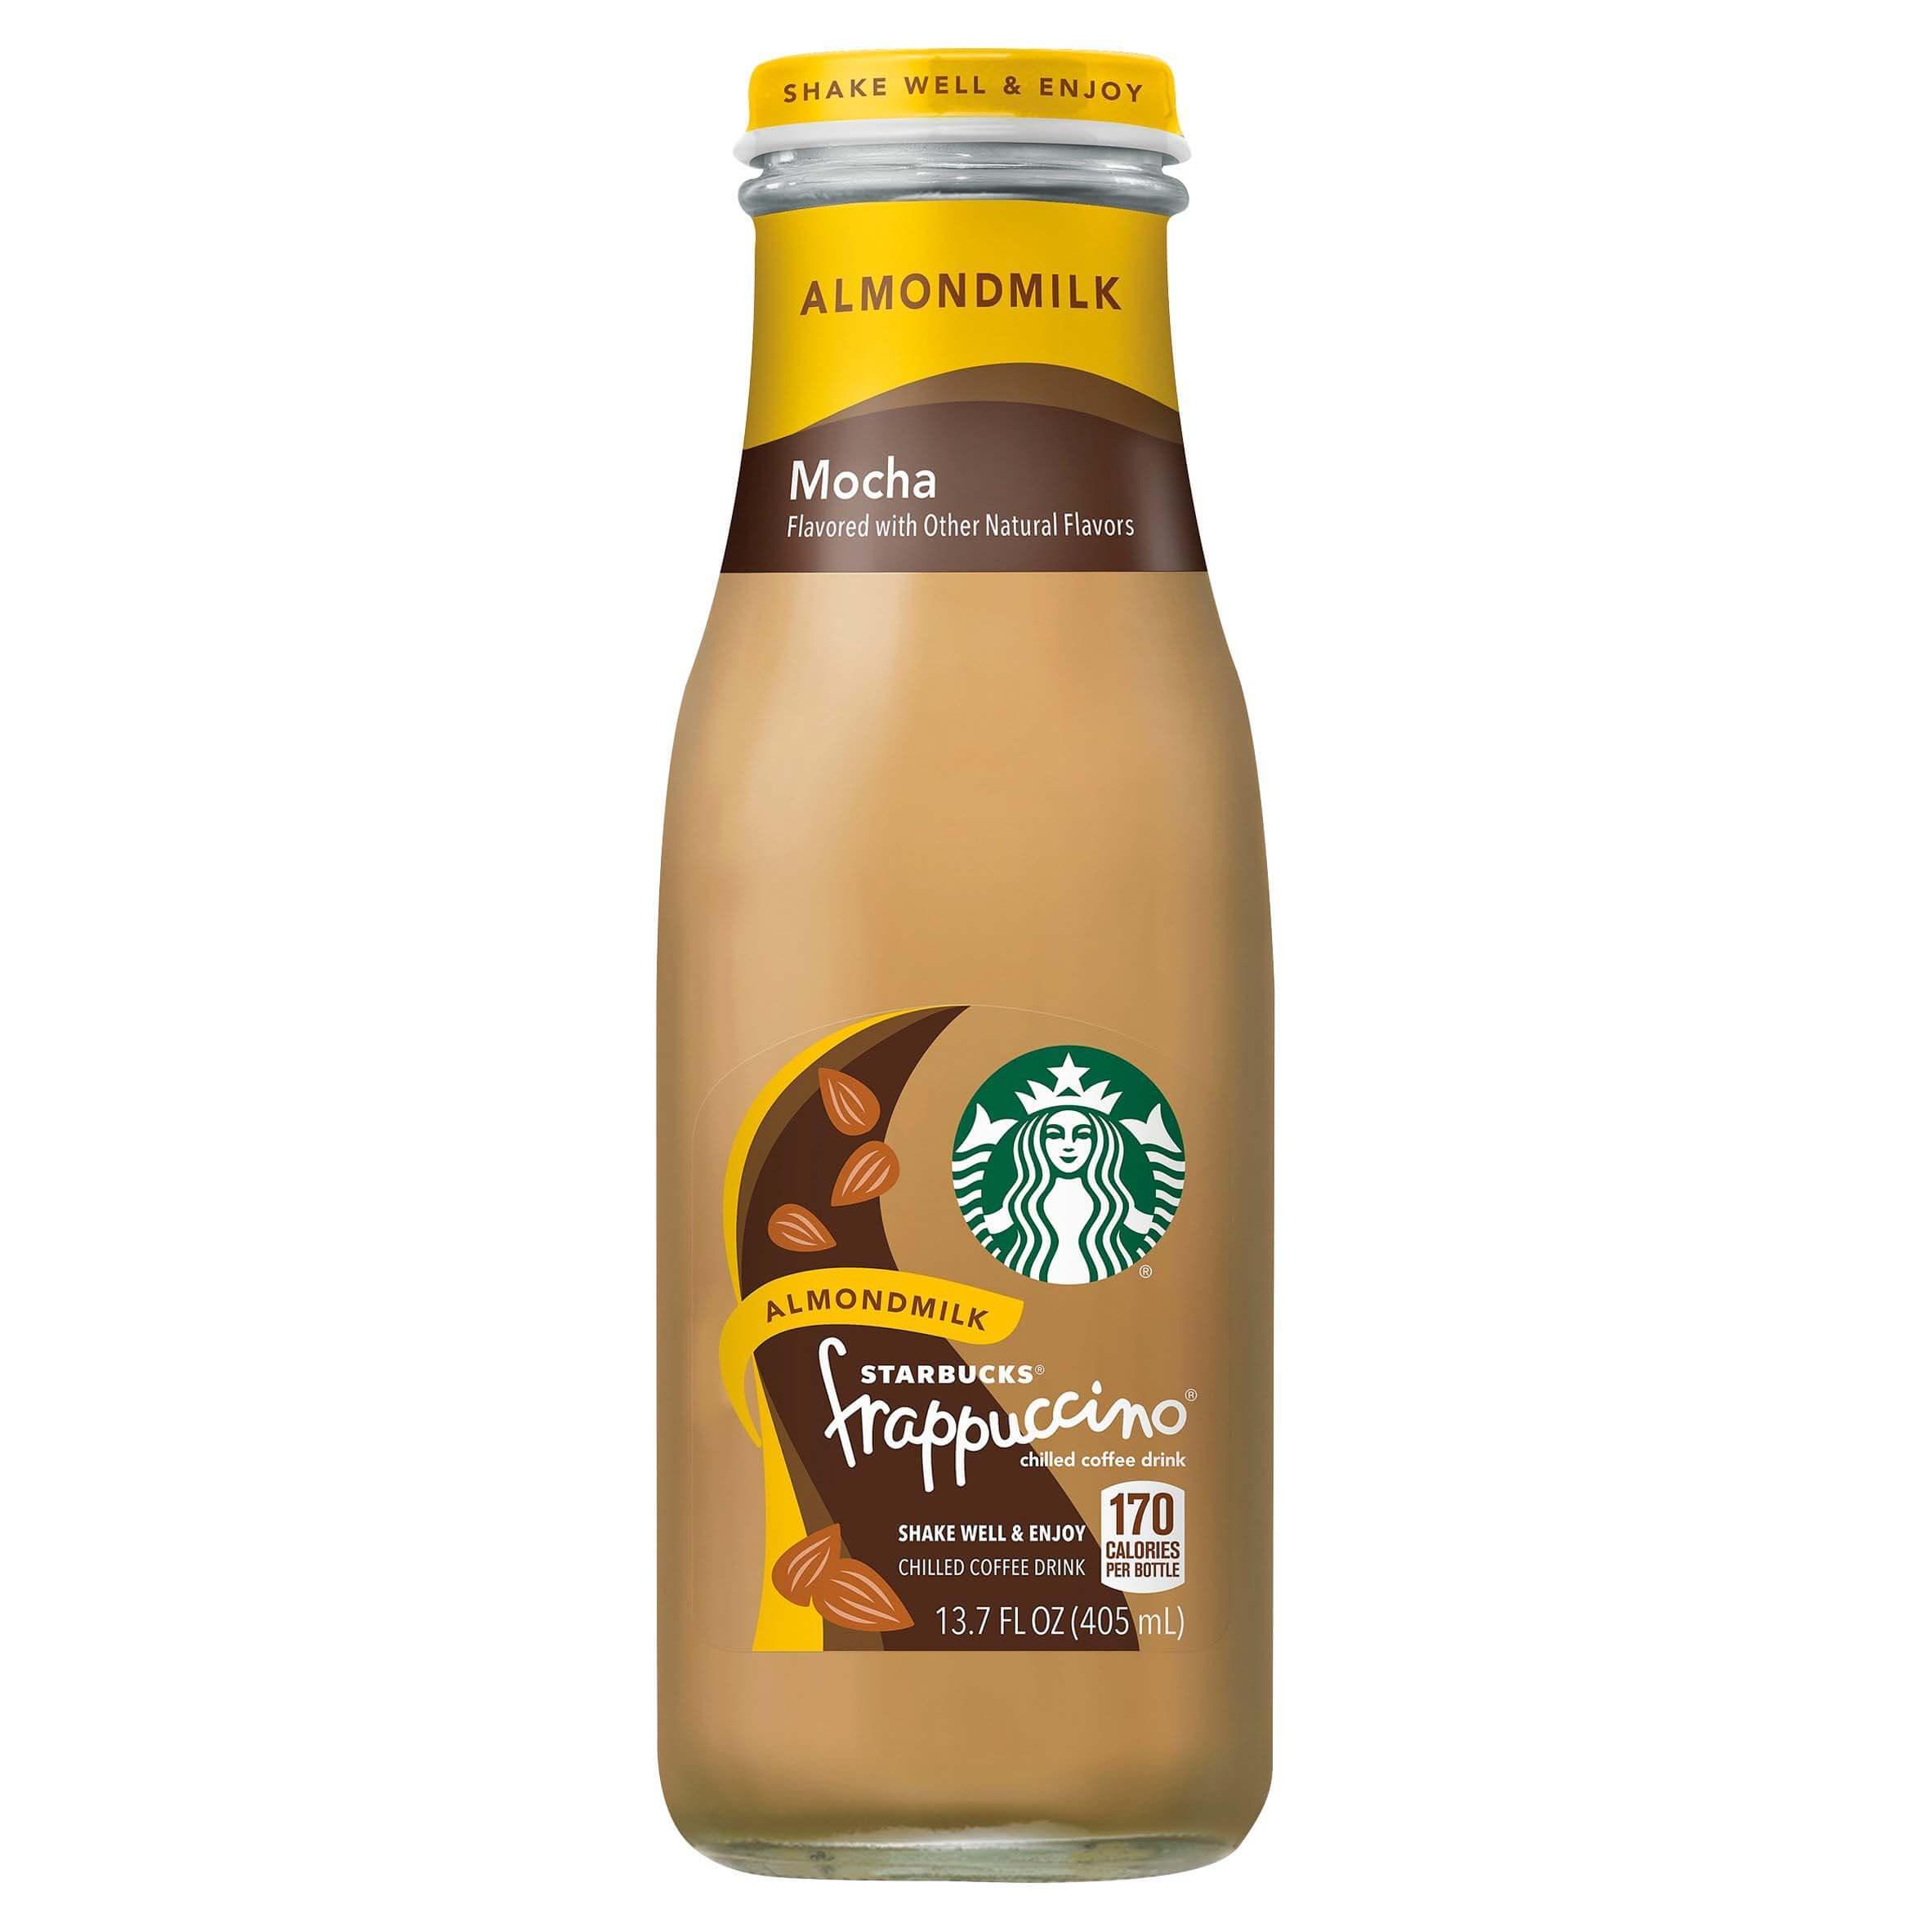 Starbucks Almond Milk Frappuccino